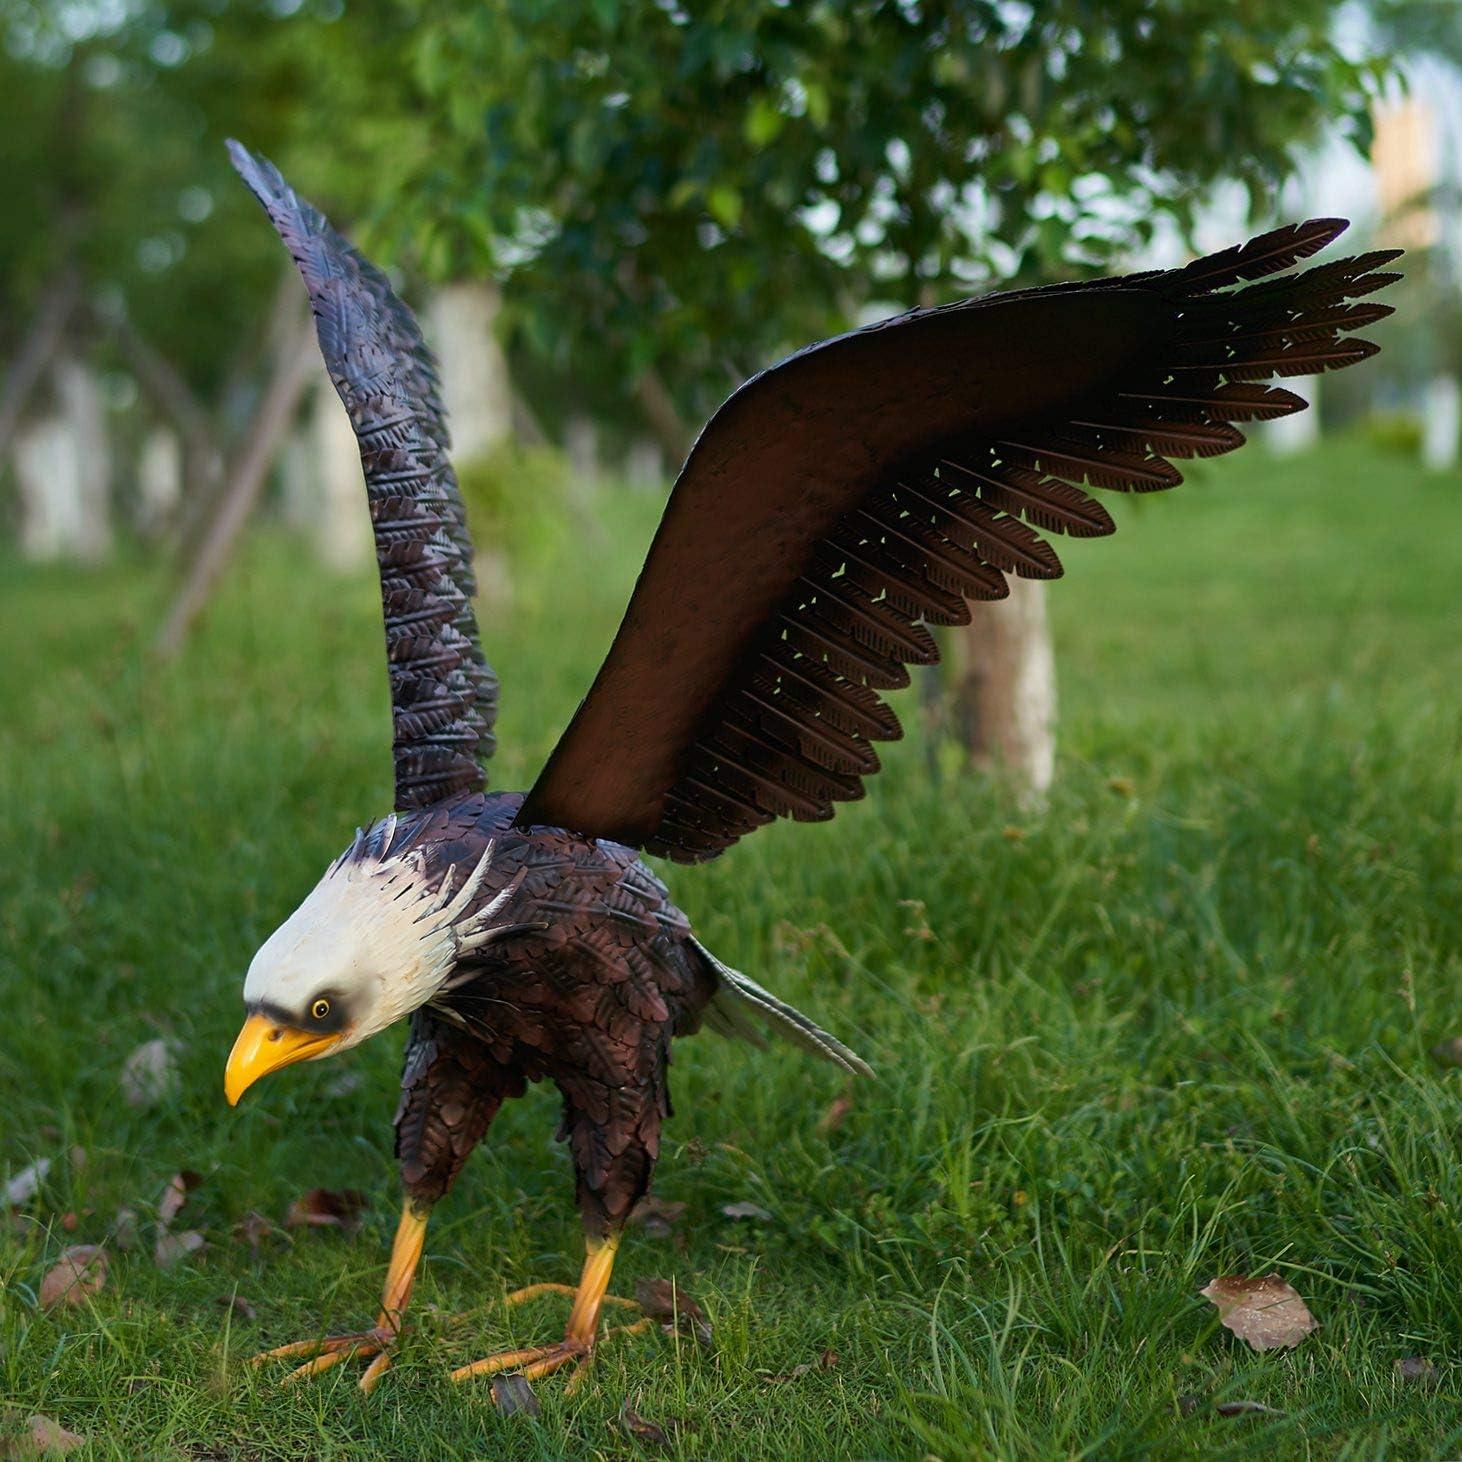 chisheen Metal Bald Eagle Garden Statue Outdoor Large Bird Metal Yard Lawn Art Sculpture